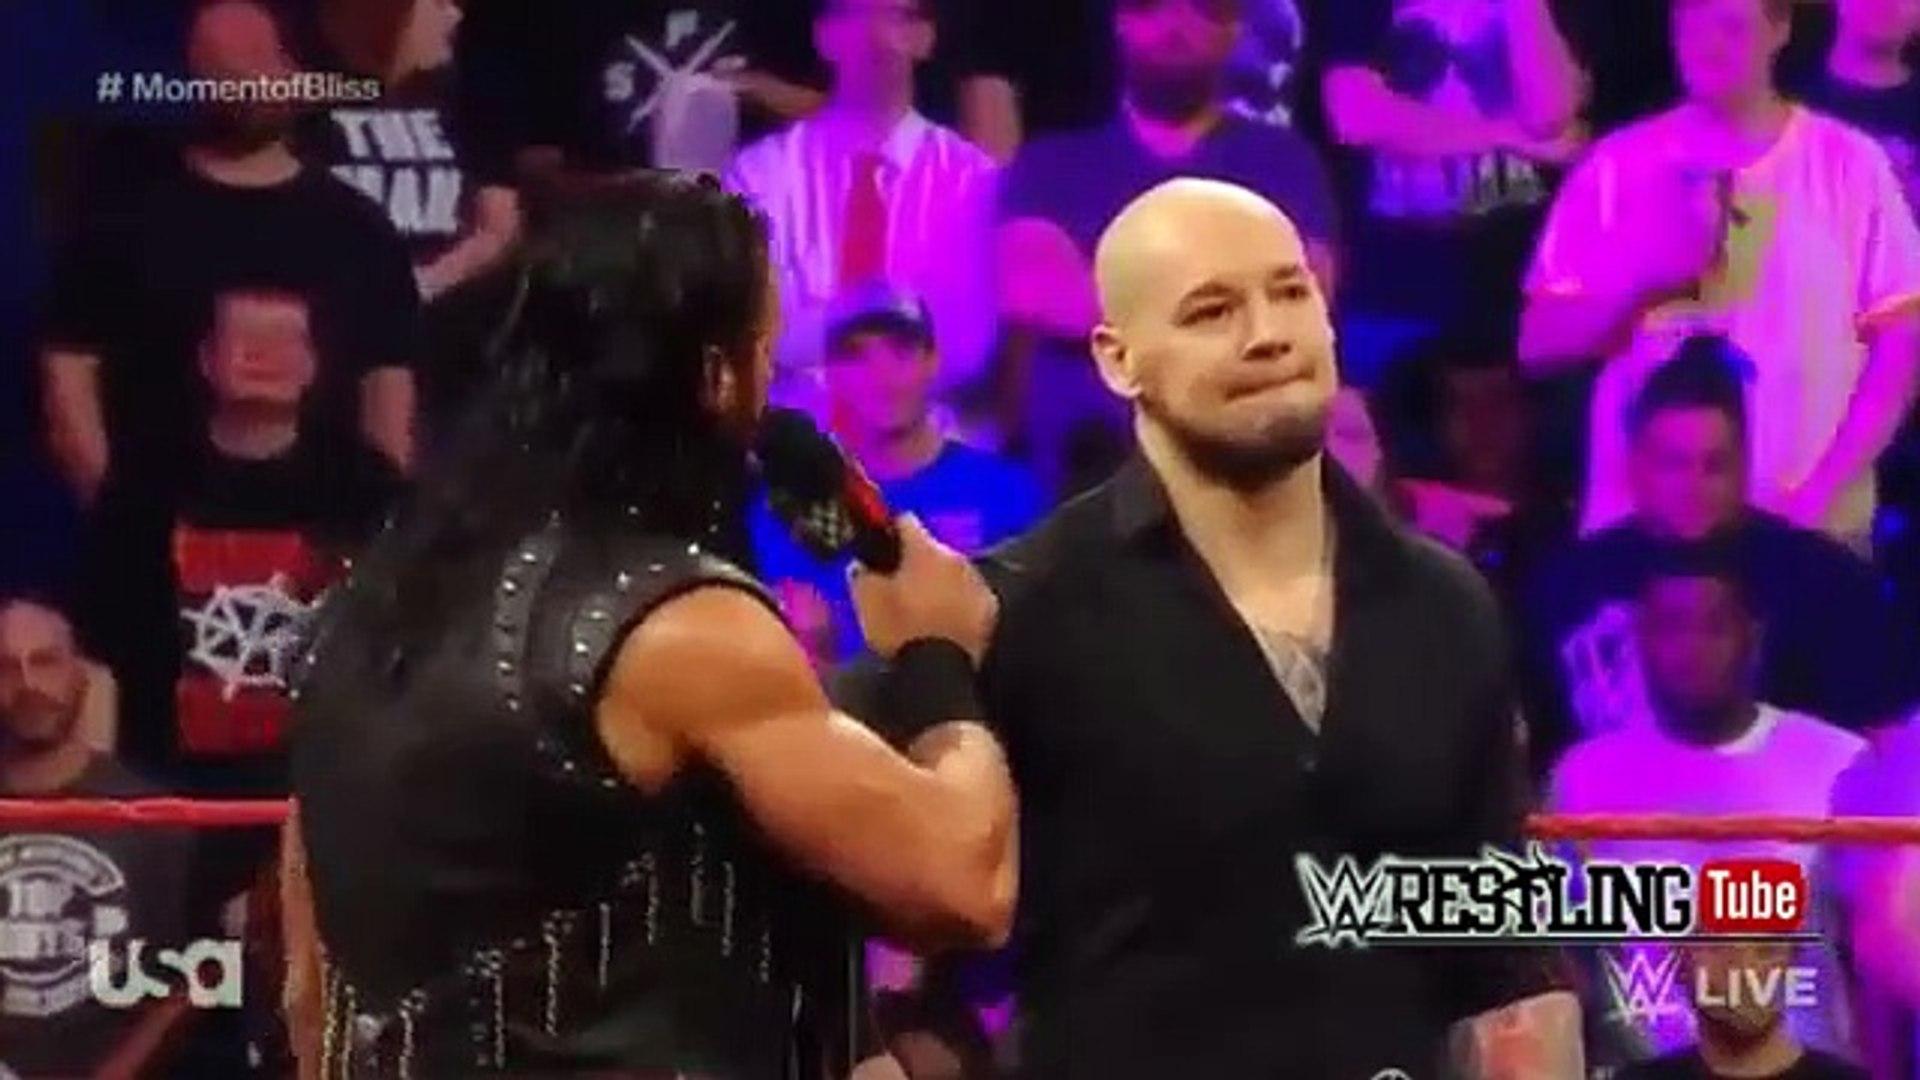 WWE RAW Highlights REPLAY 1 May 2019 HD - WWE RAW 2019 Full-Show Highlights HD